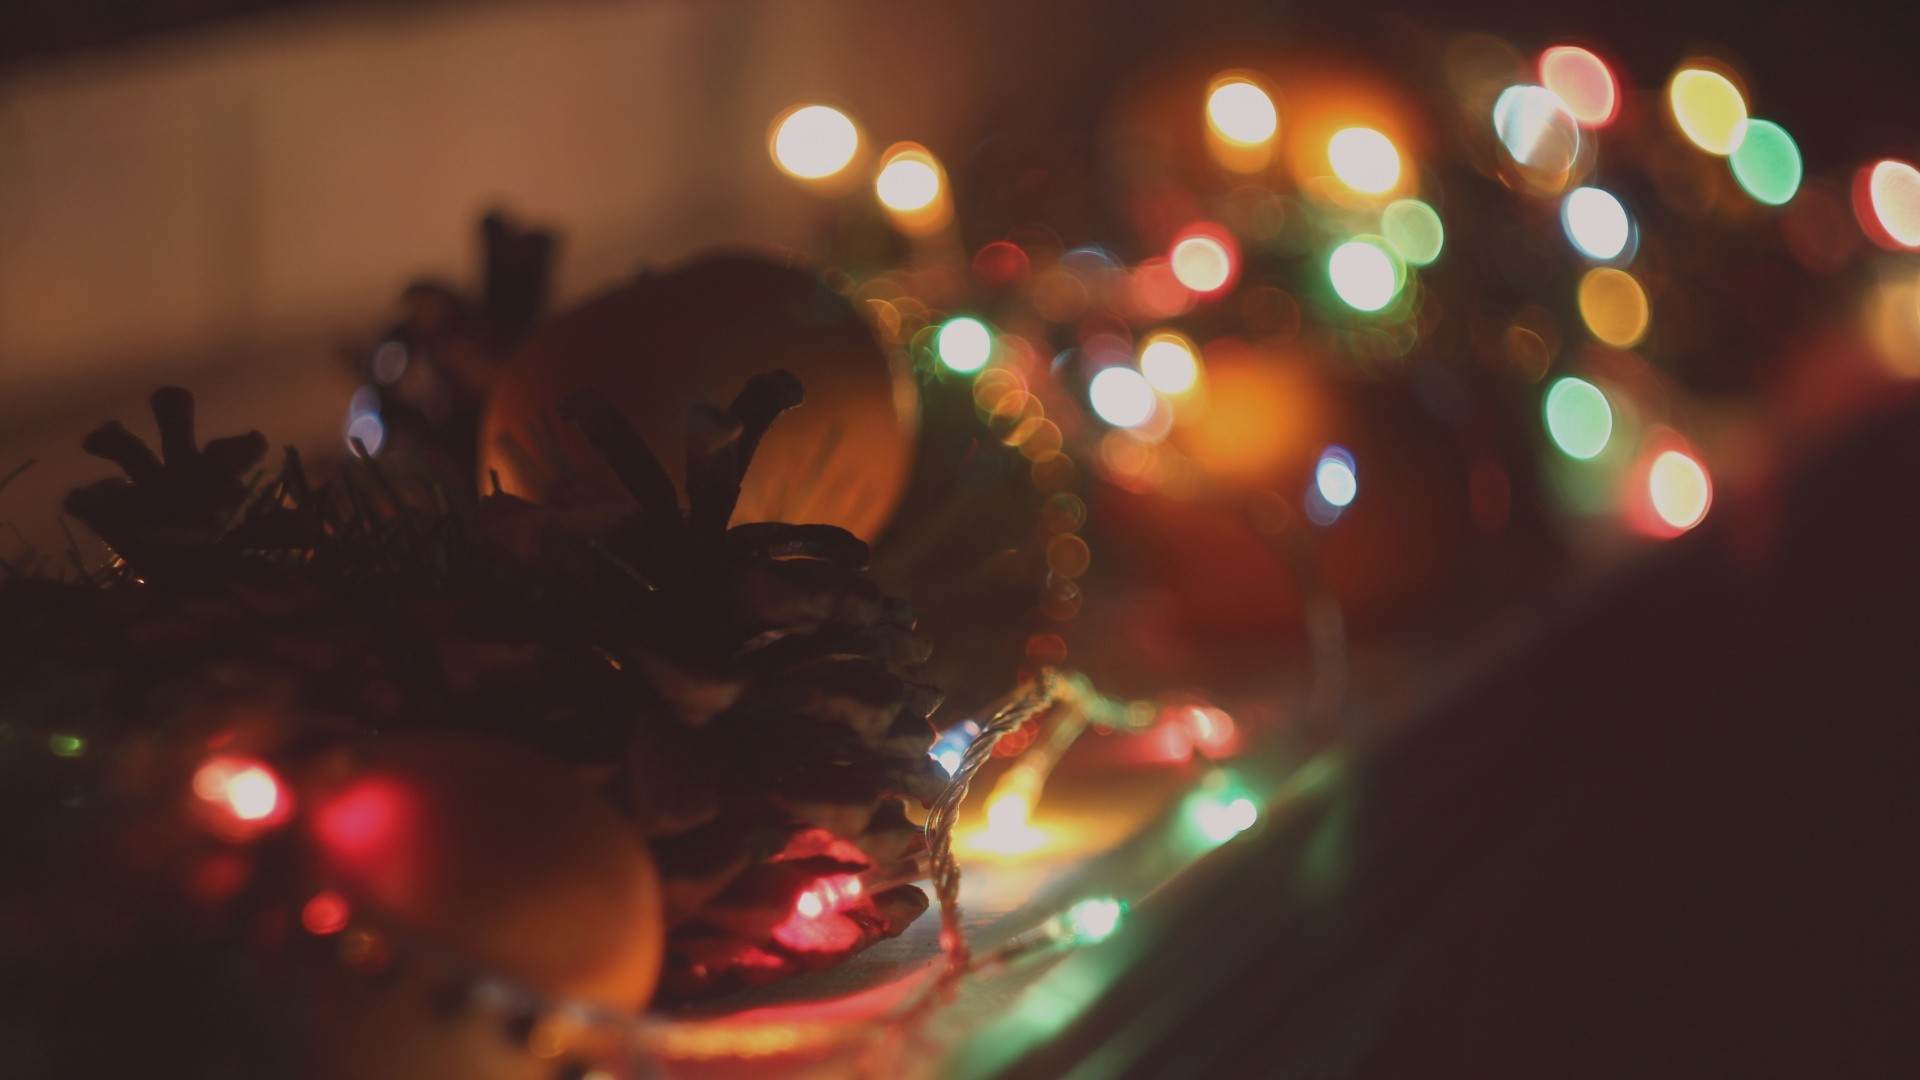 Aesthetic Christmas hd wallpaper download